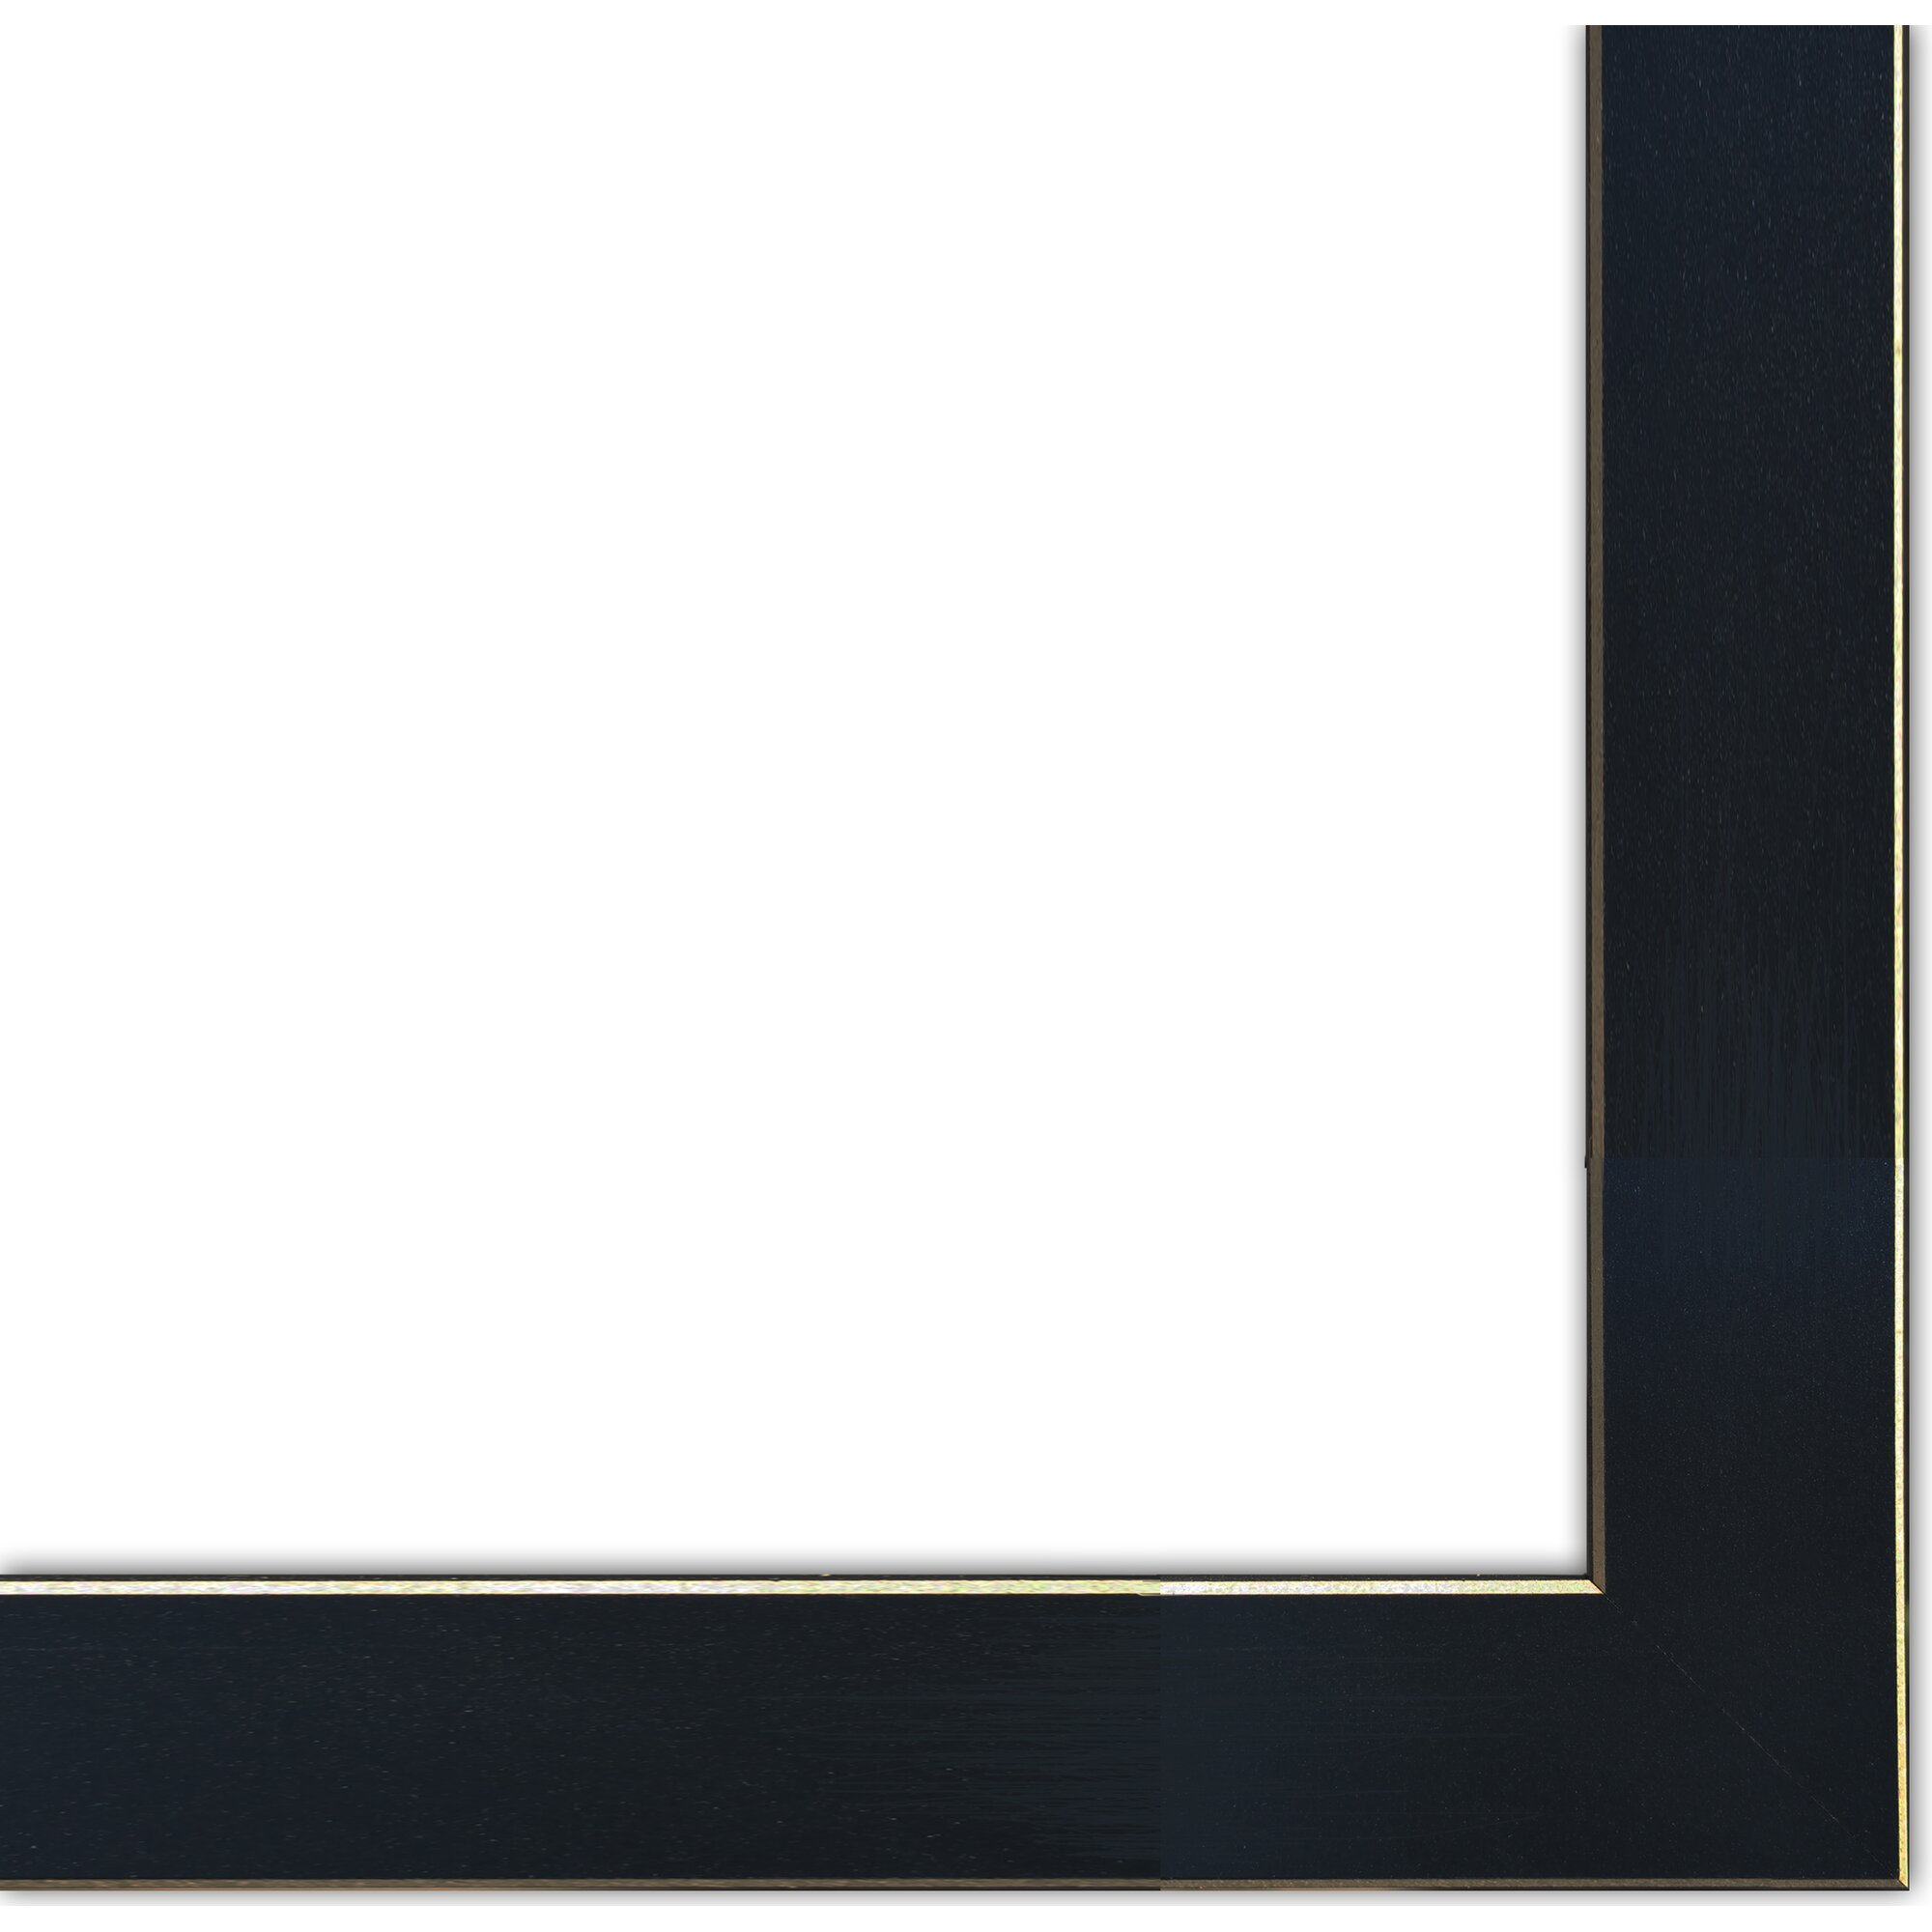 Trendy decor 4u headin 39 home by billy jacobs framed for Home decor 4 u